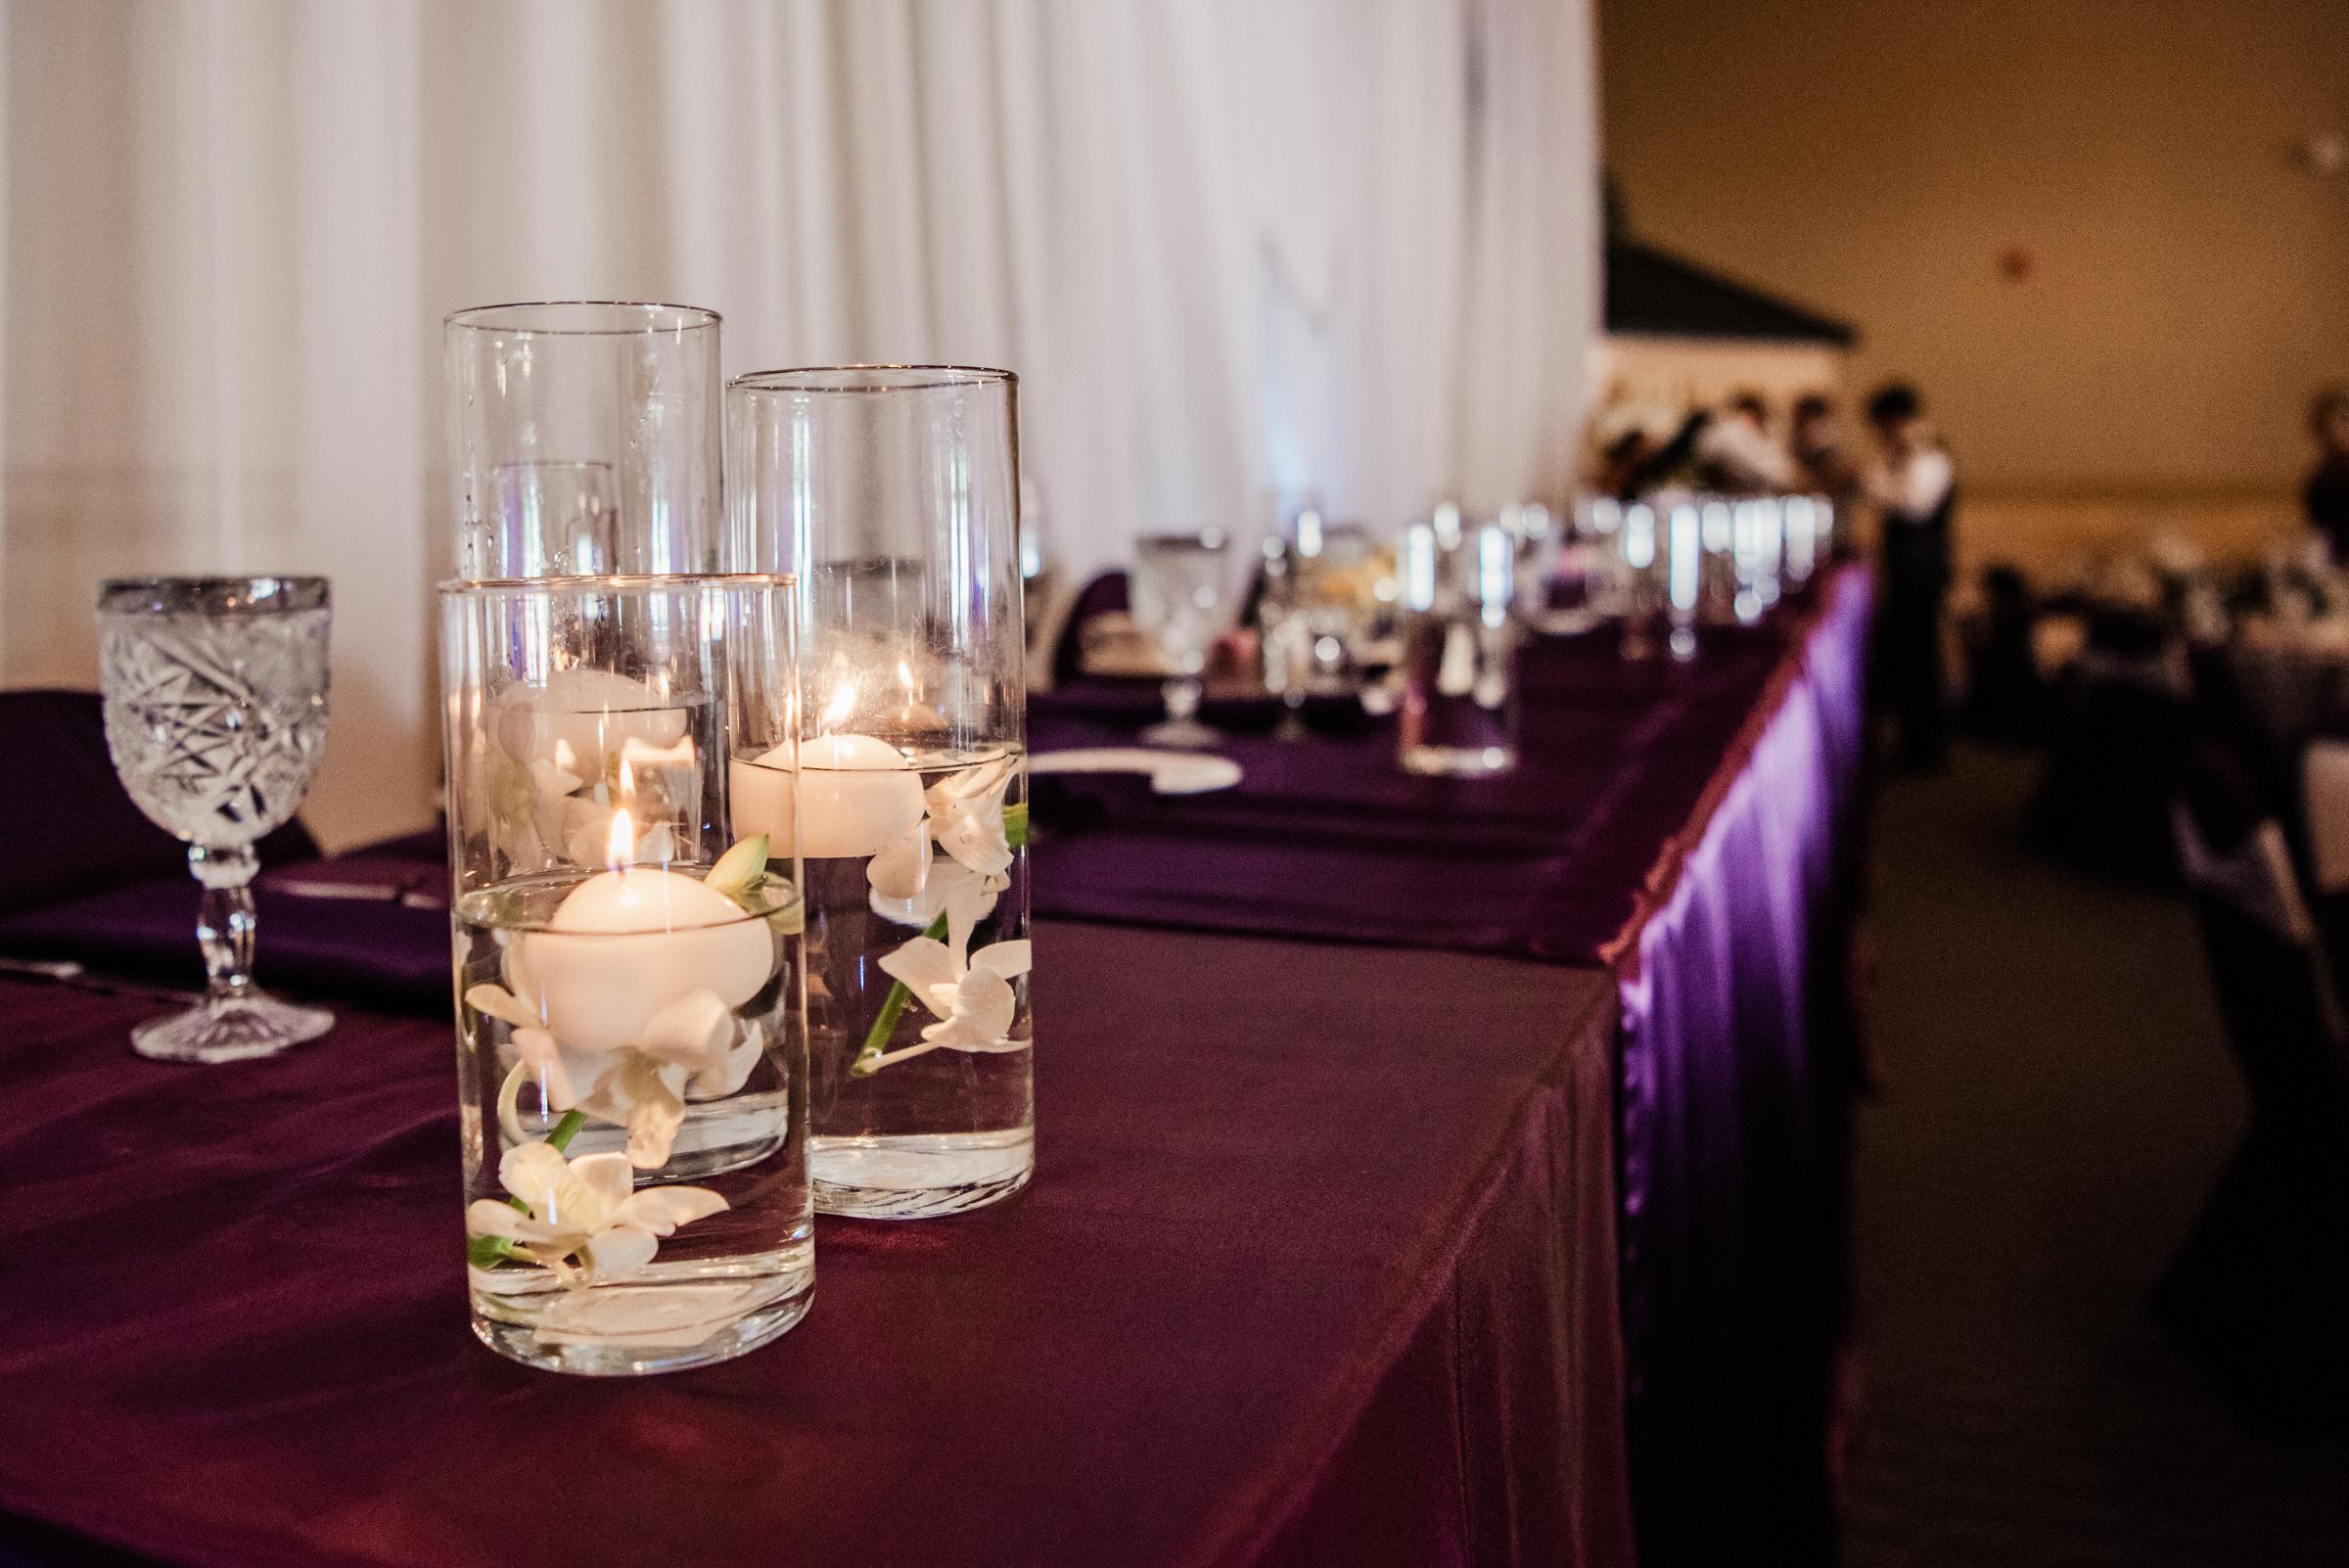 Historic_Old_St_Johns_Church_Valentinos_Banquet_Hall_Central_NY_Wedding_JILL_STUDIO_Rochester_NY_Photographer_DSC_6505.jpg